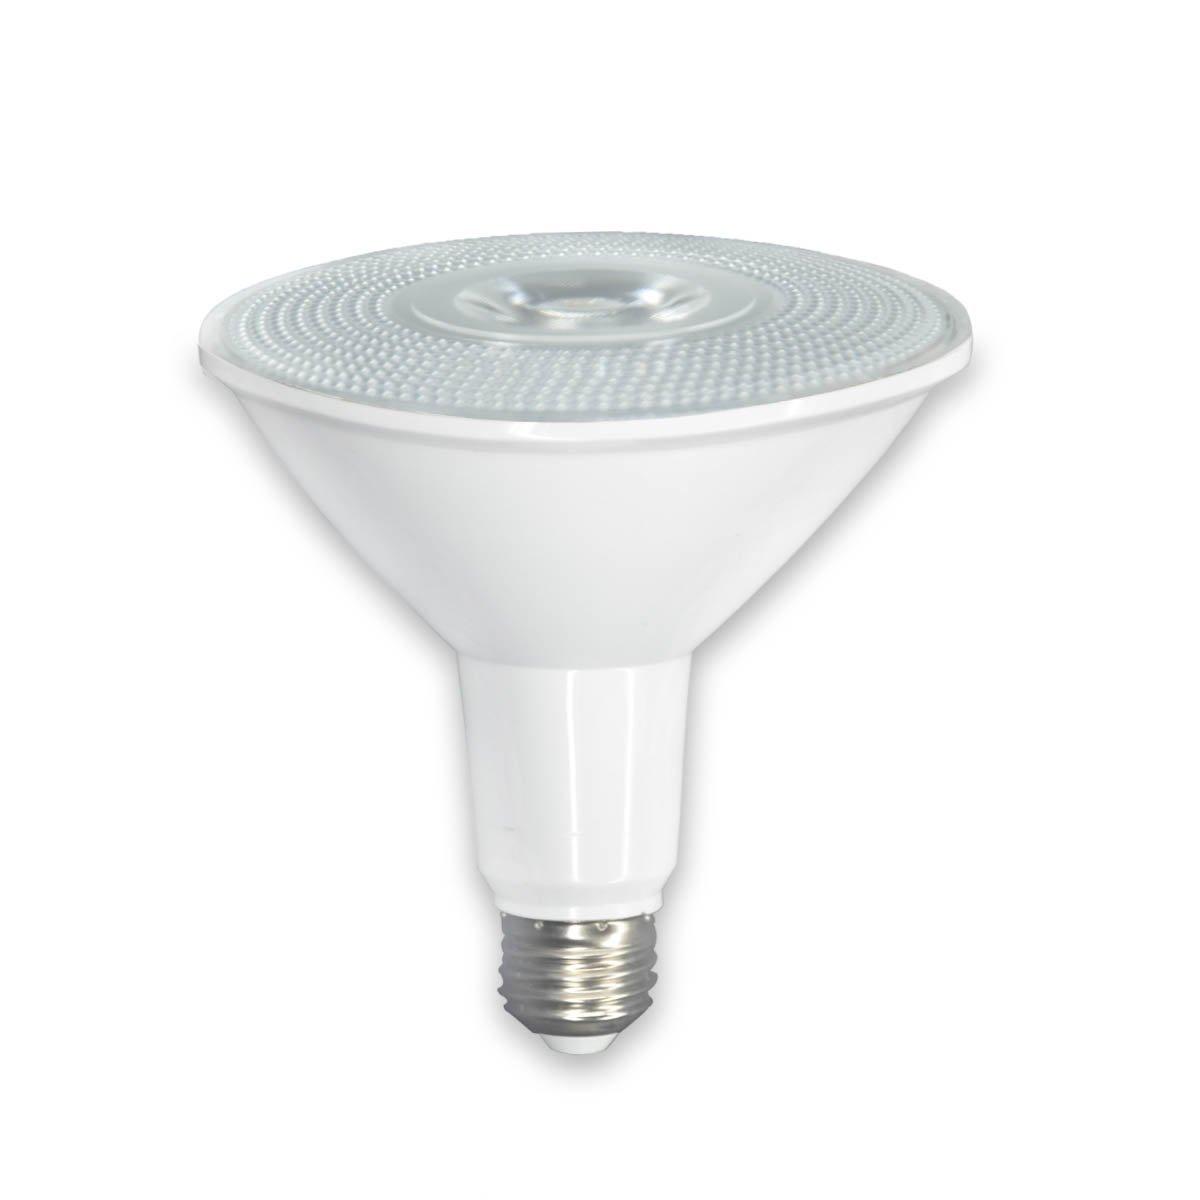 30W PAR38 LED Spot Light Bulb, IP65 Both Outdoor and Iutdoor Use,200W about Equivalent, 2500lm, 3000K White, 40 Degree Beam Angle, Medium Base(E26), tight beam angel Led Flood Light Bulb